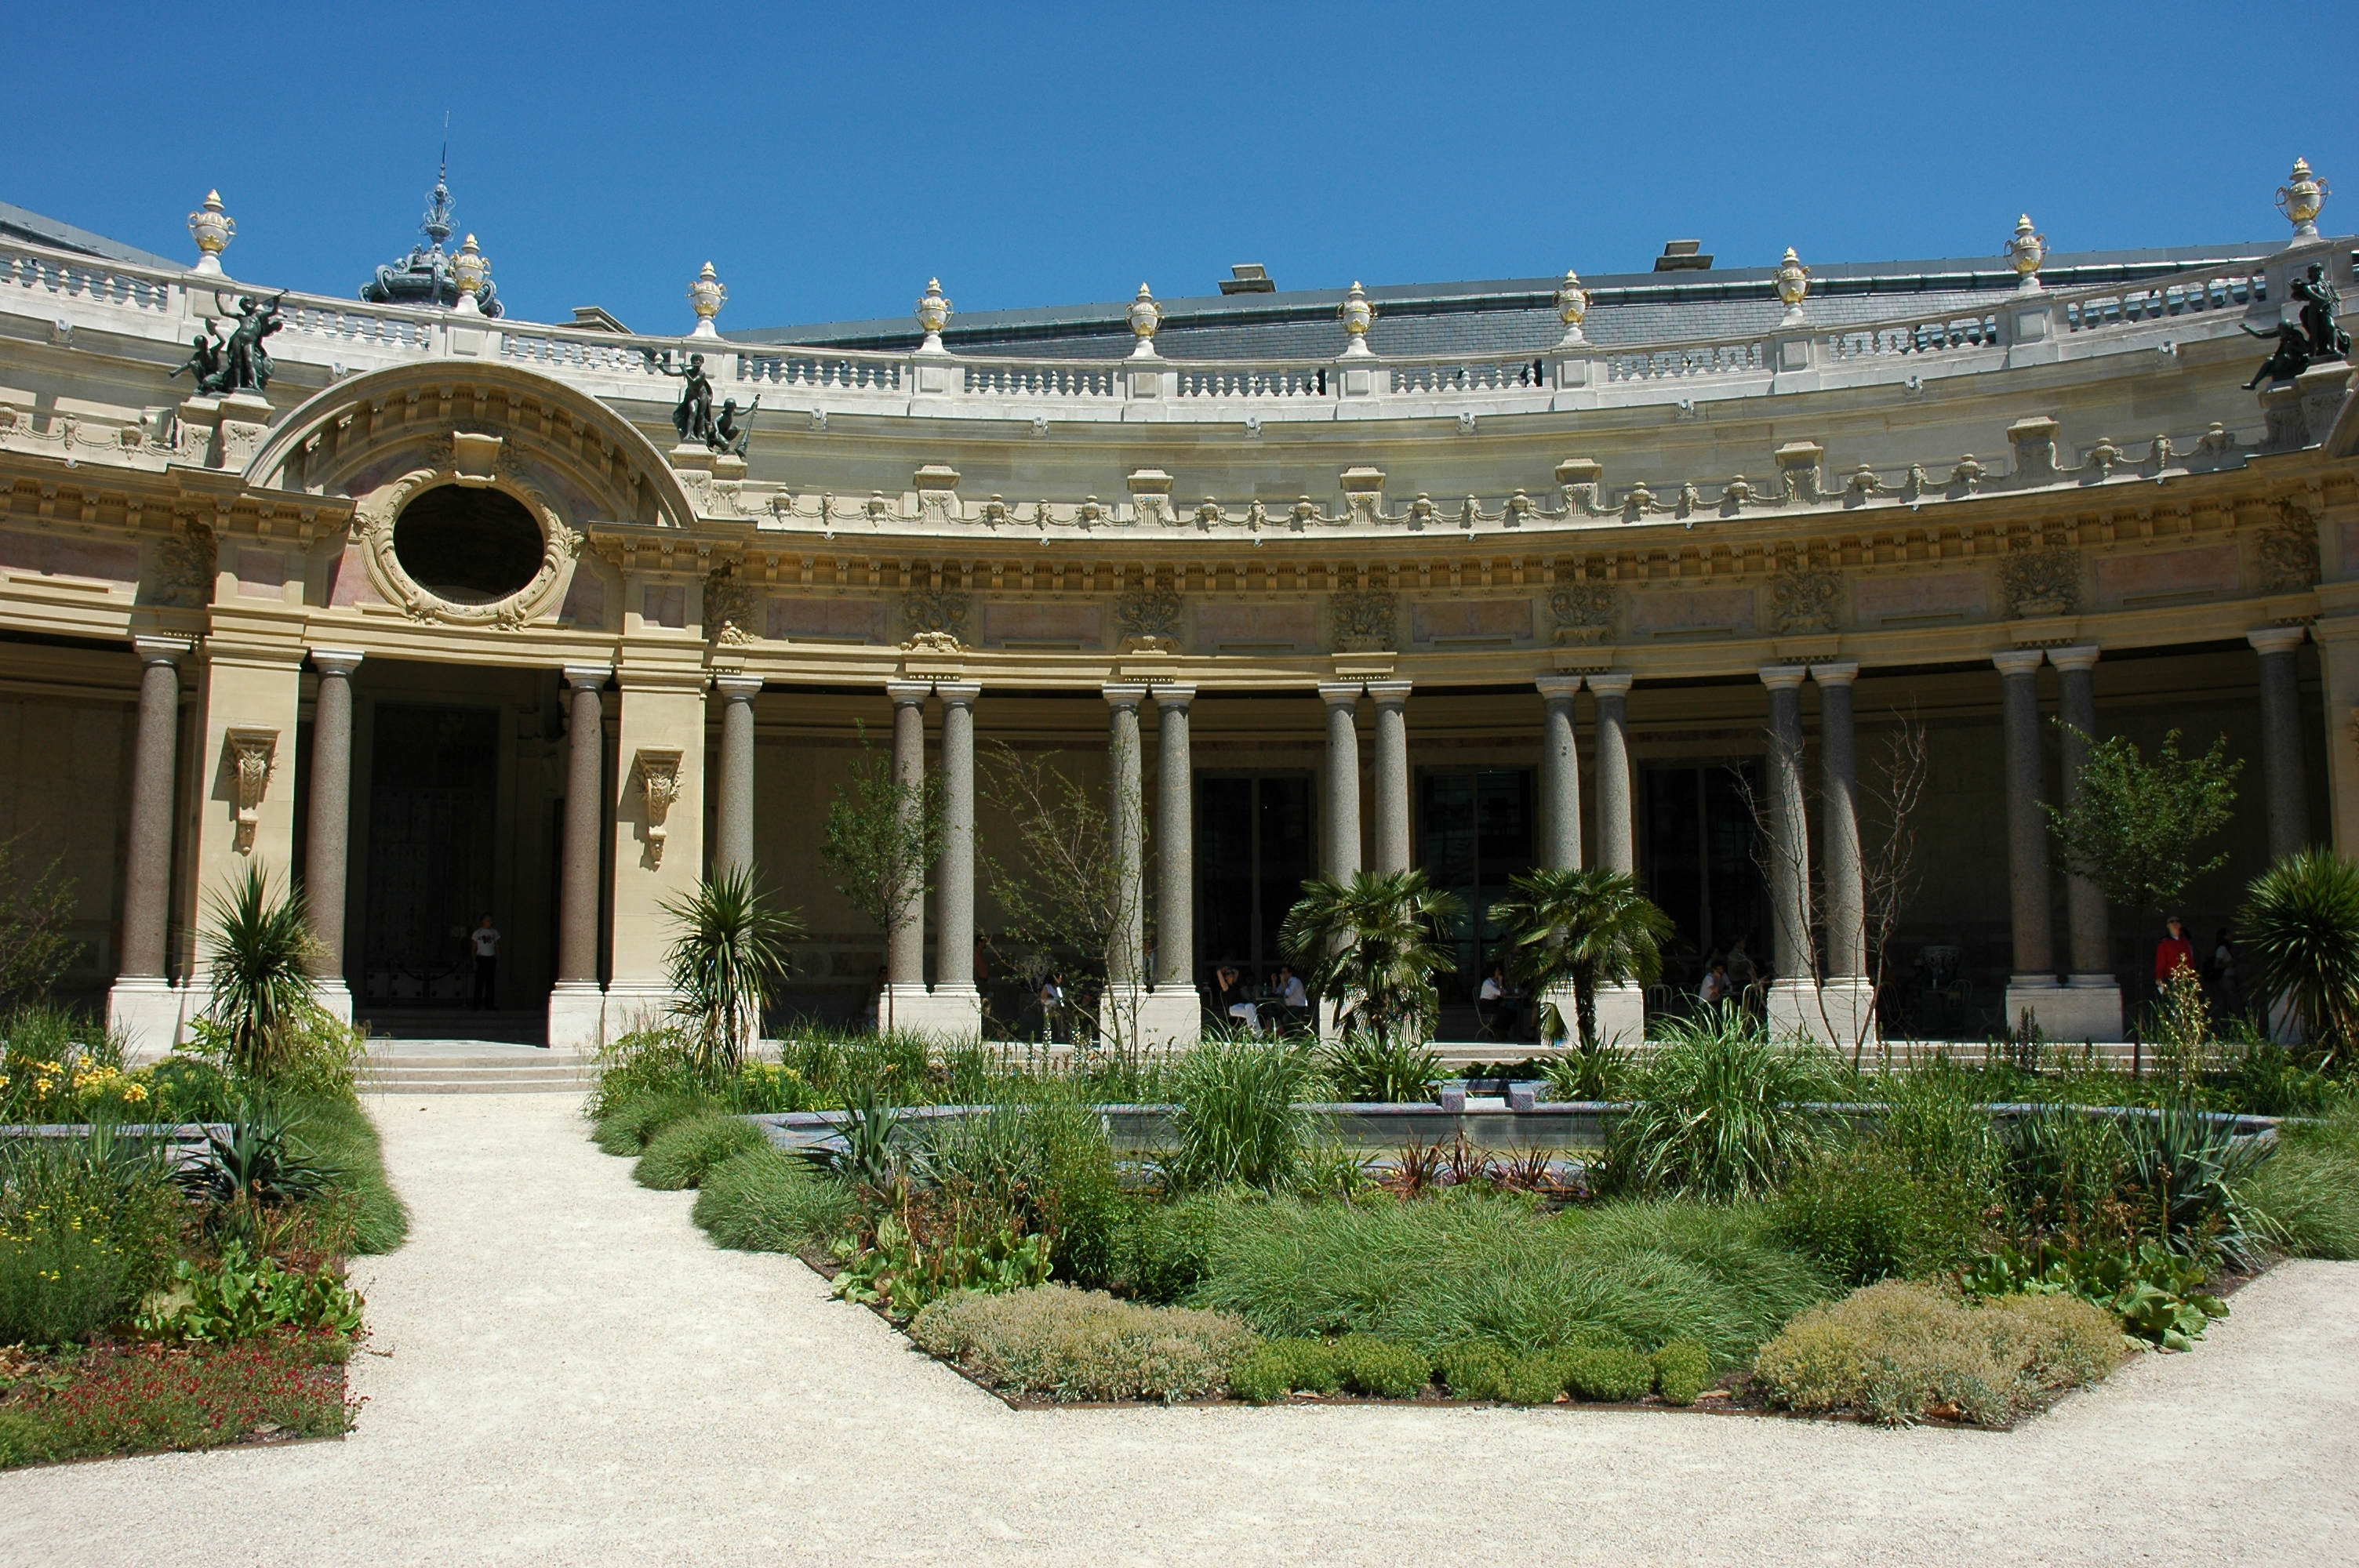 File:France Paris Petit Palais Jardin interieur 04.JPG - Wikimedia ...